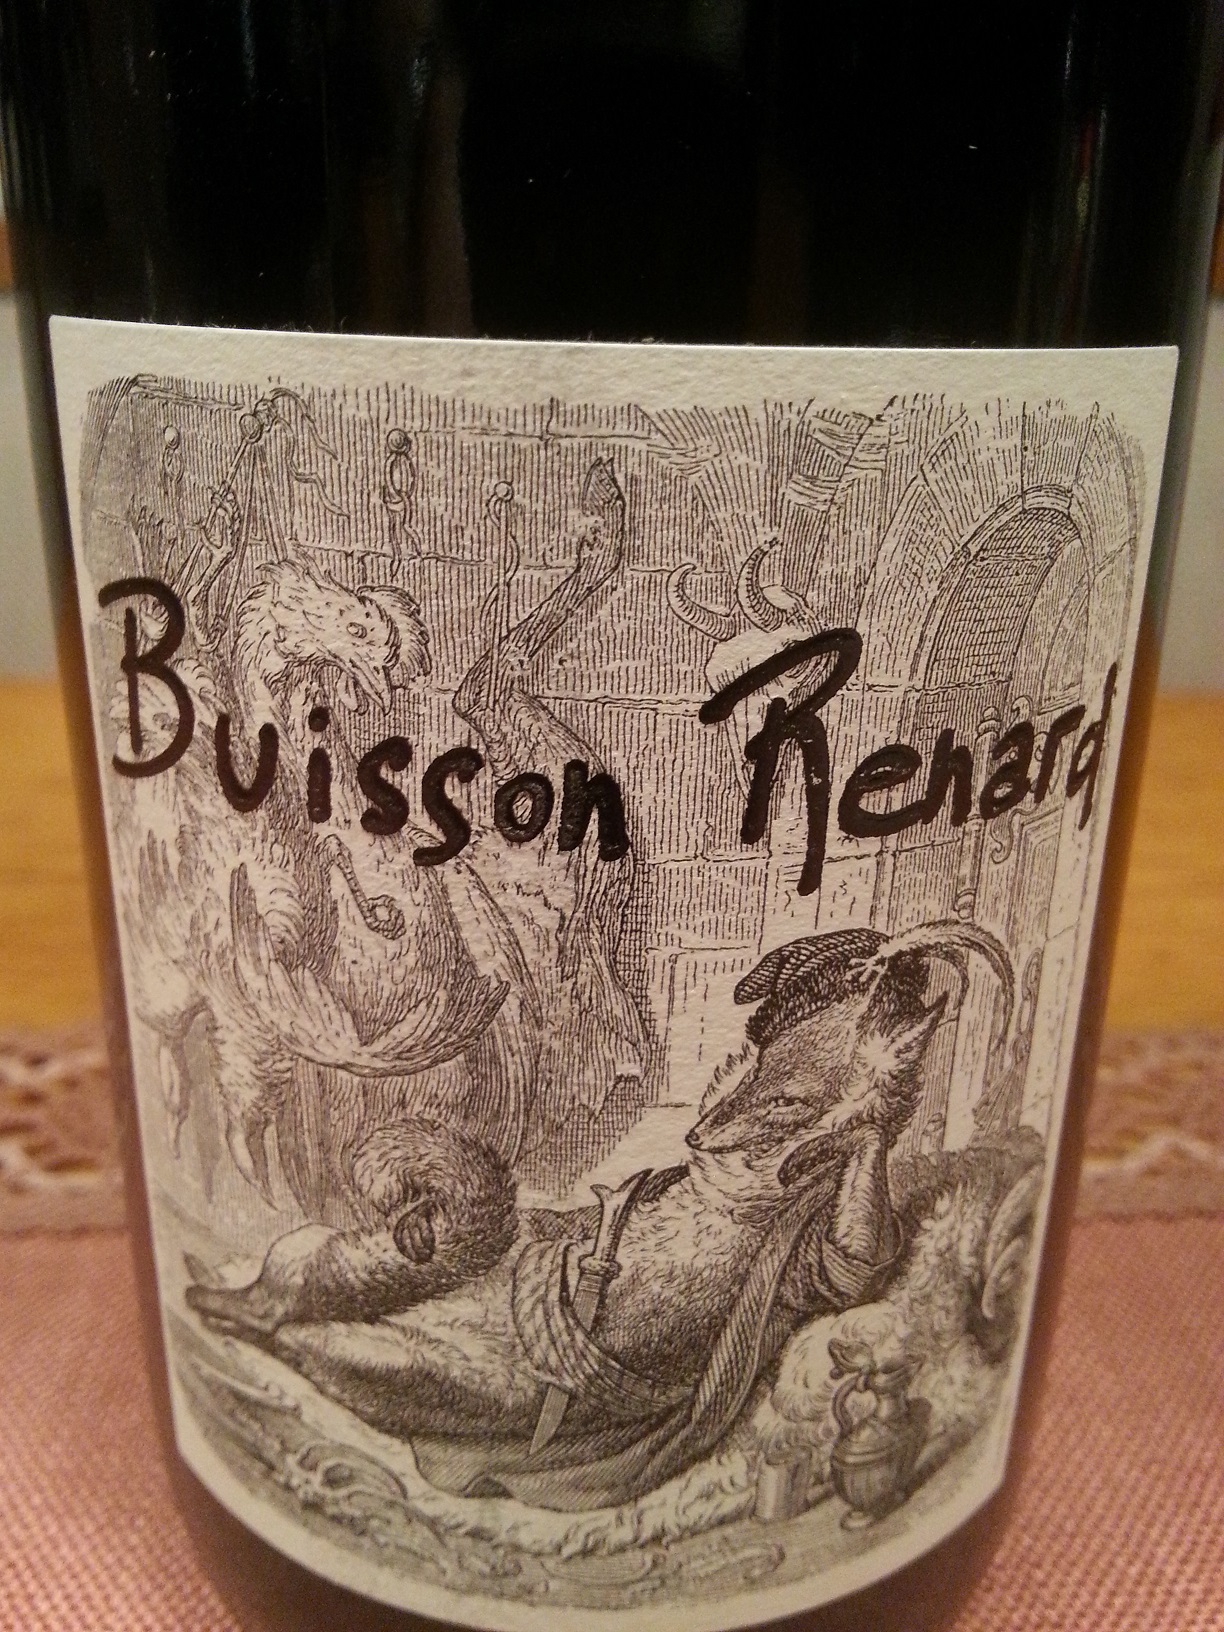 2004 Buisson Renard | Dagueneau